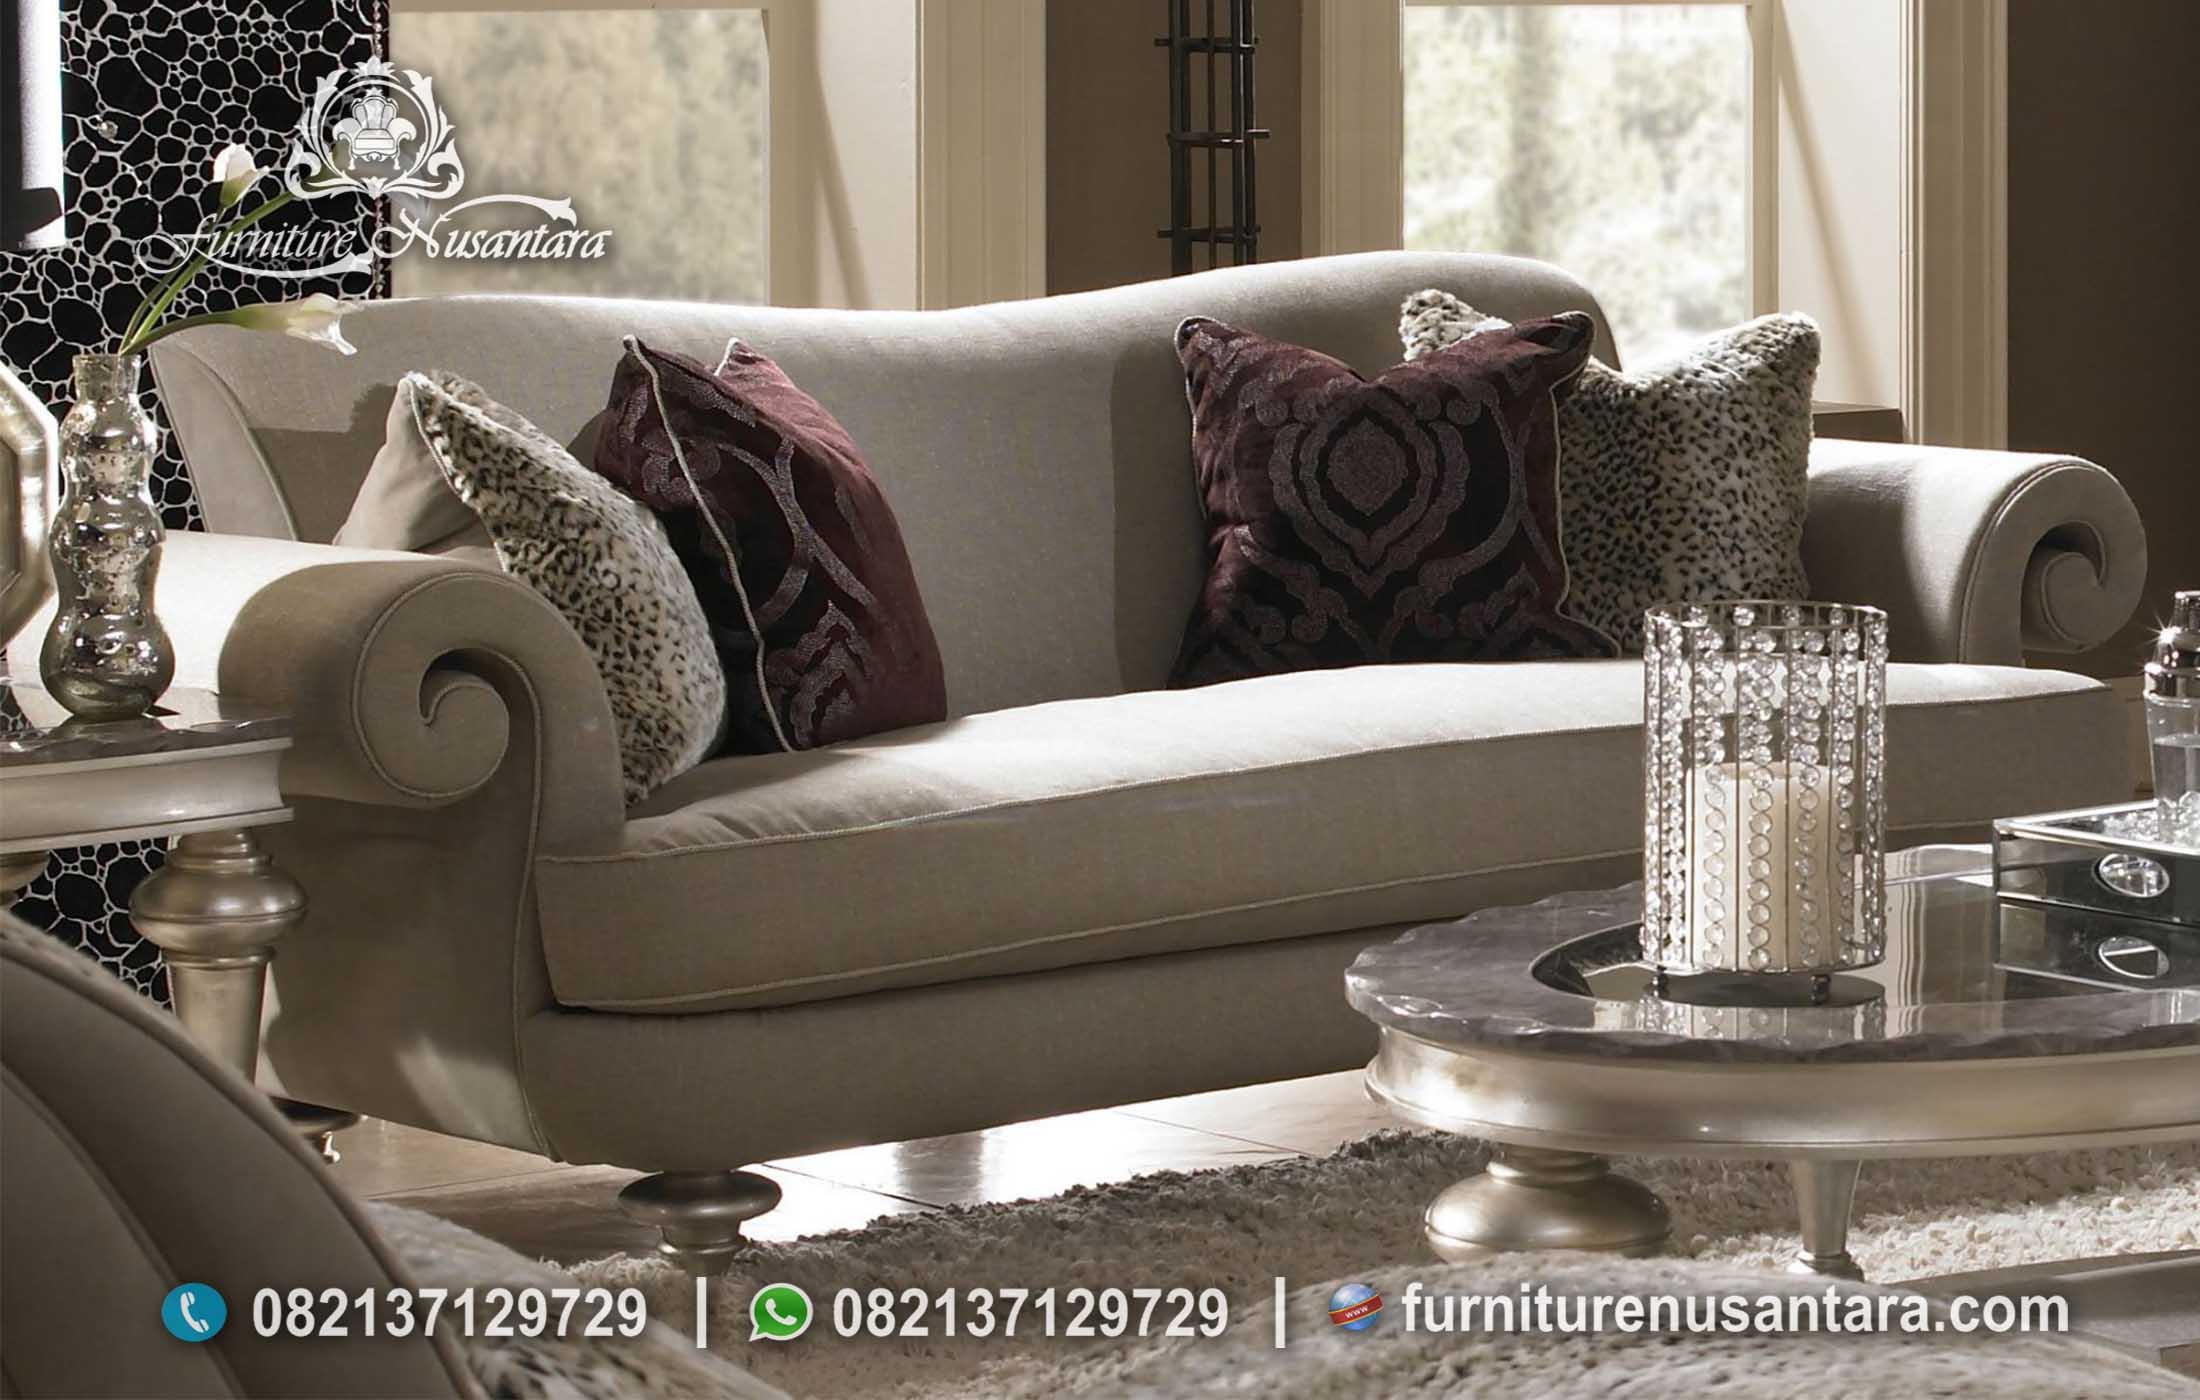 Set Sofa Tamu Minimalis Eropa ST-88, Furniture Nusantara